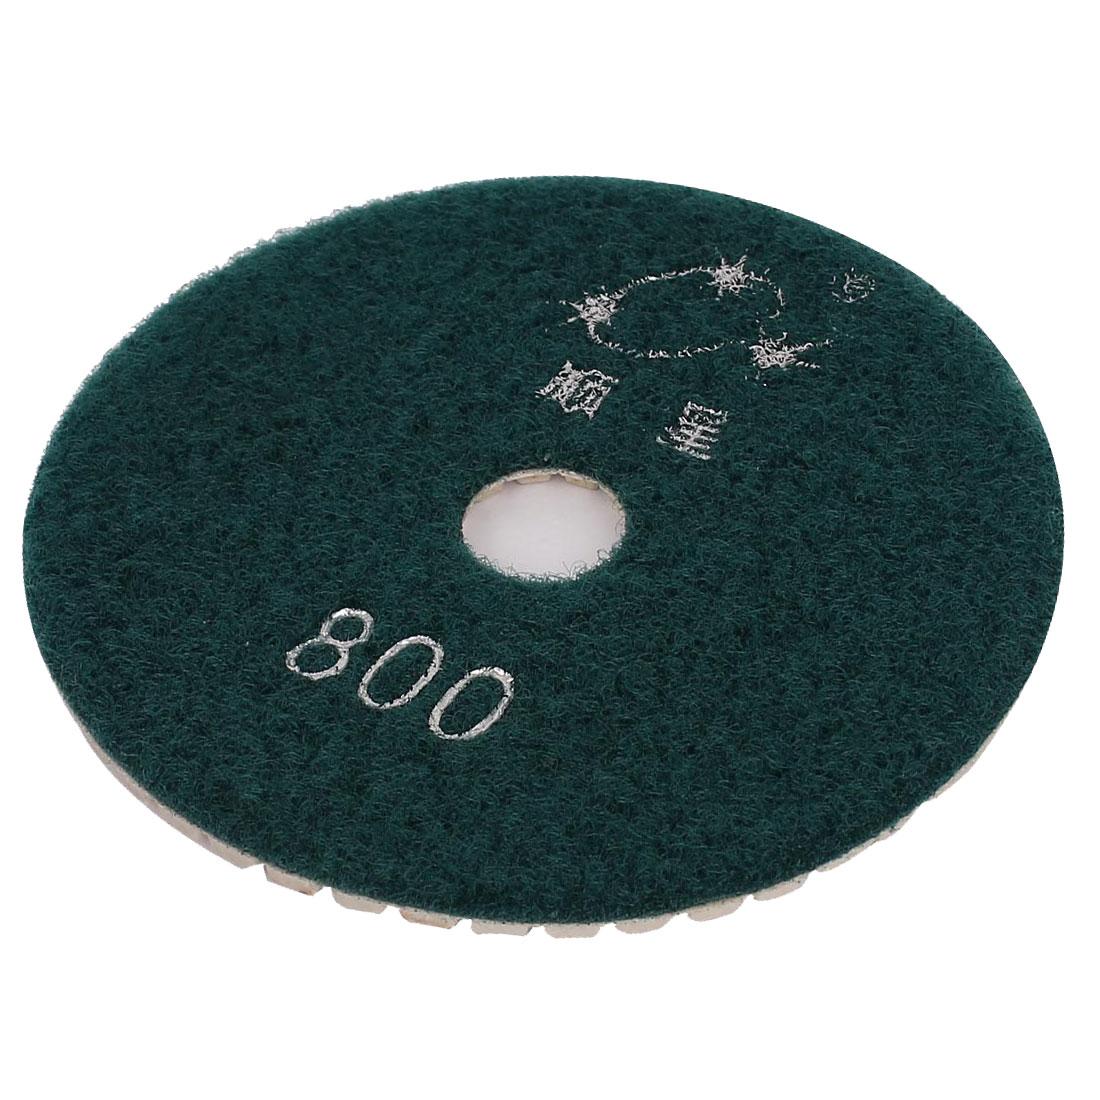 100mmx16mm Diamond Polishing Wet Pad Green 800 Grit for Granite Marble Concrete